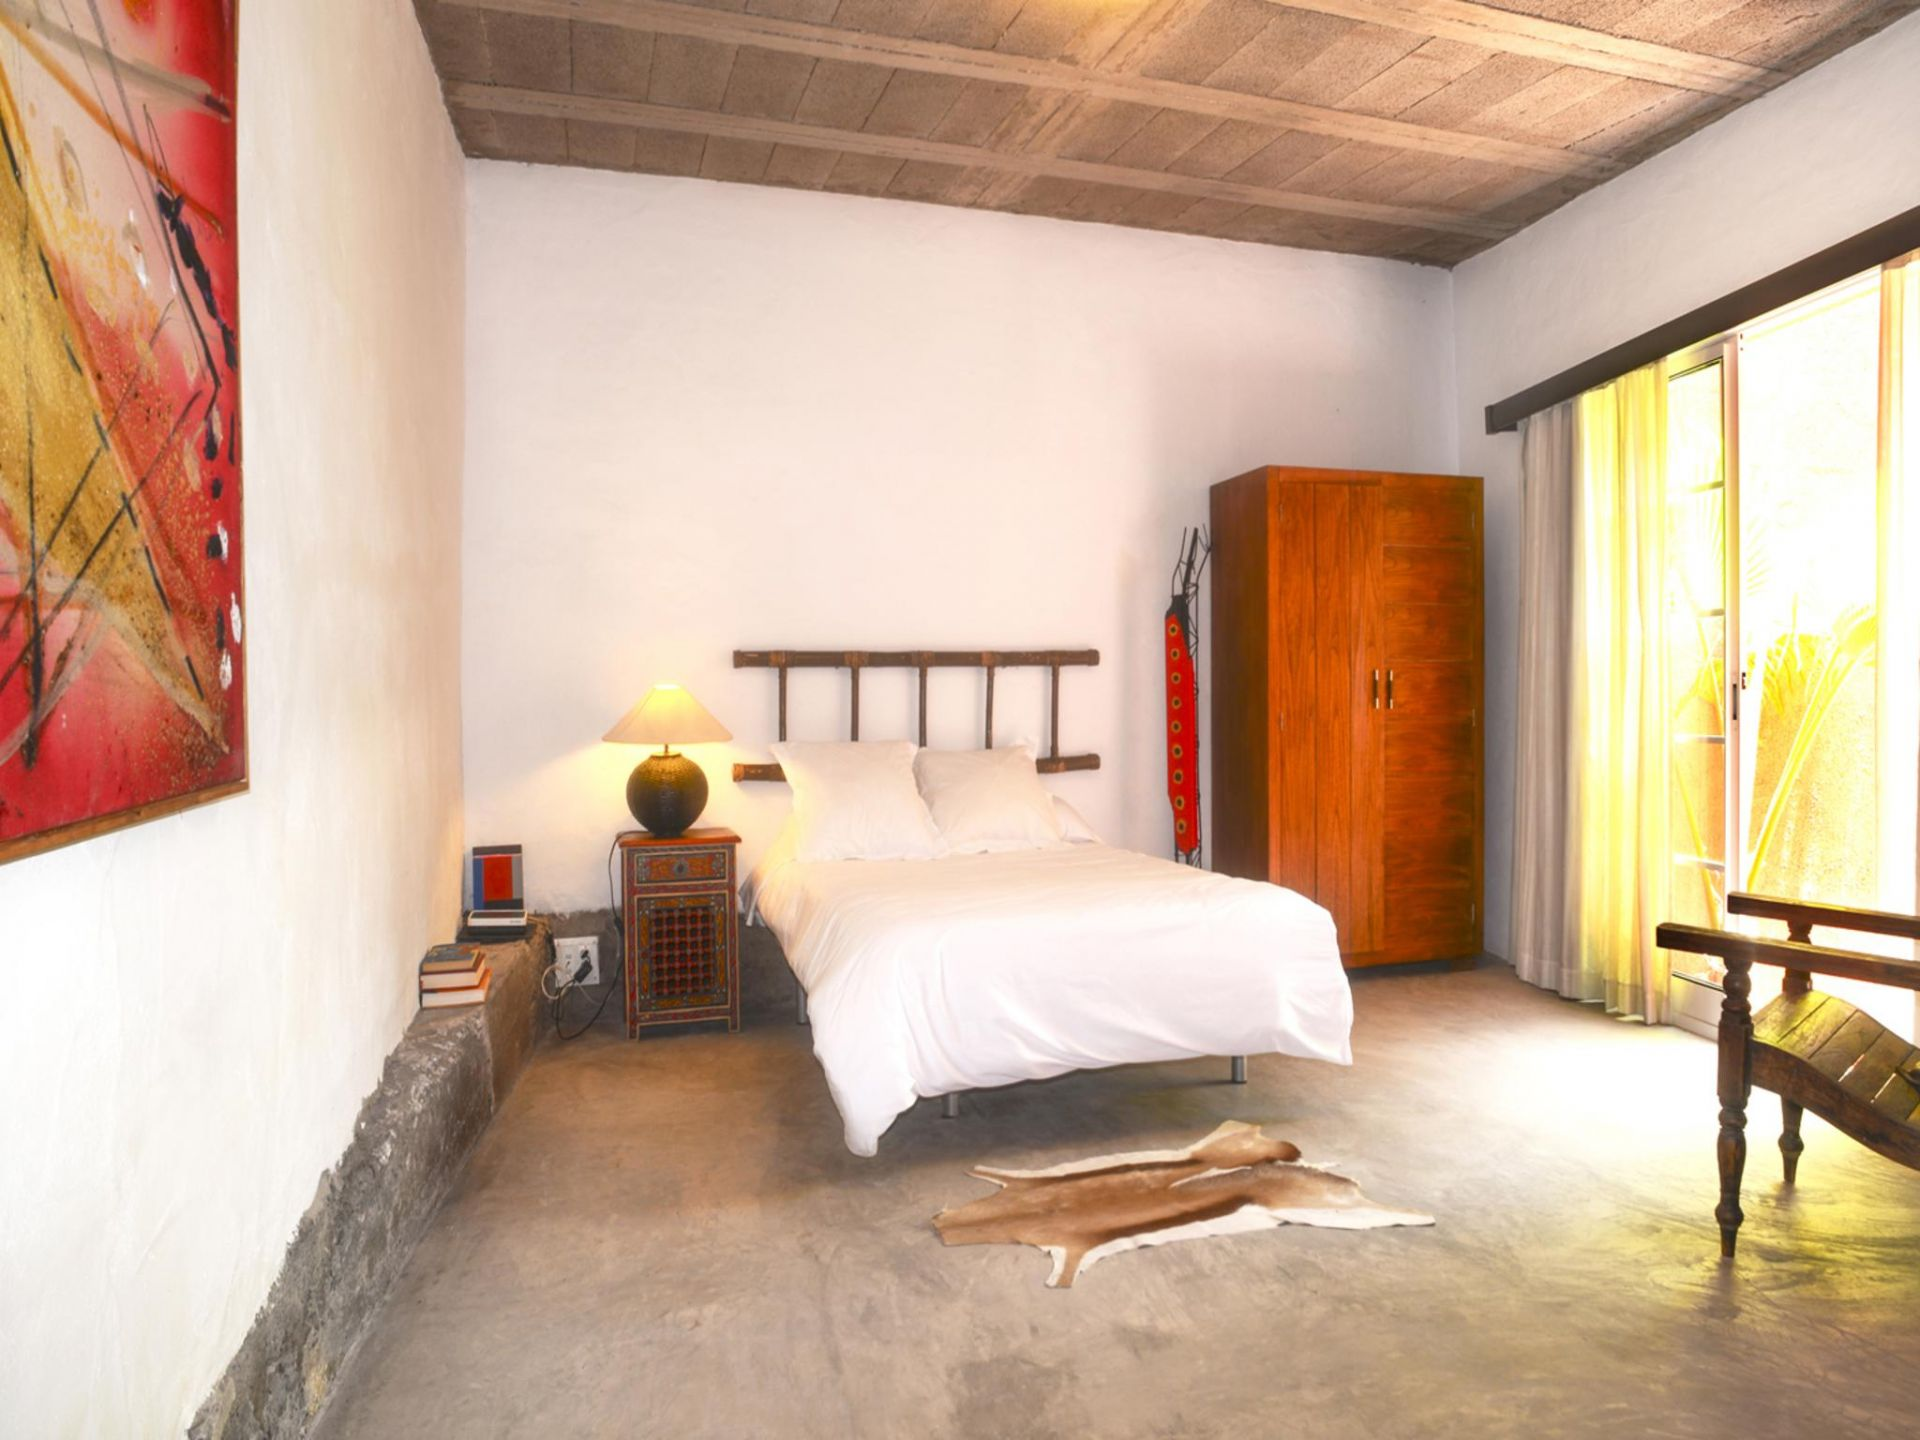 Holiday apartment Villa San Agustin 10 - Holiday Rental (854295), Maspalomas, Gran Canaria, Canary Islands, Spain, picture 24